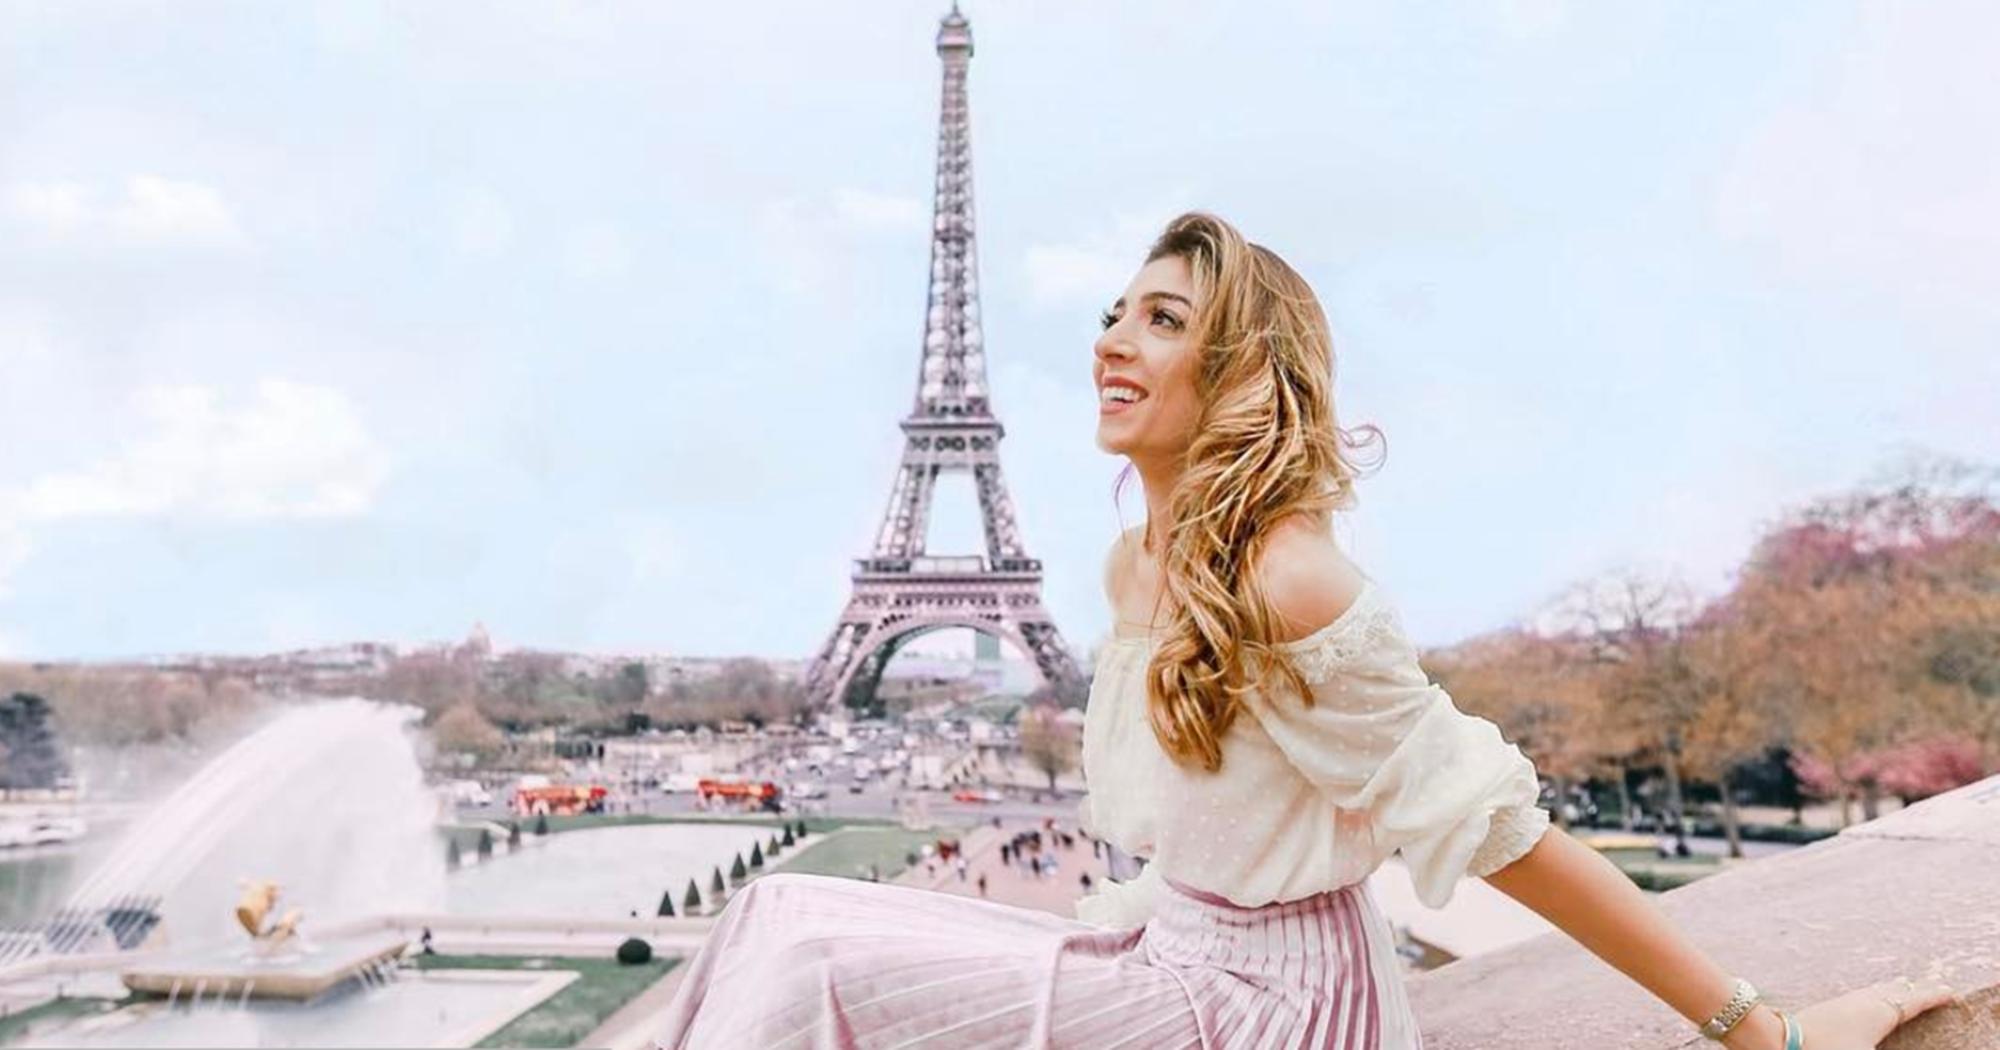 Amelia Liana Instagram Photoshop Fake Pictures Response